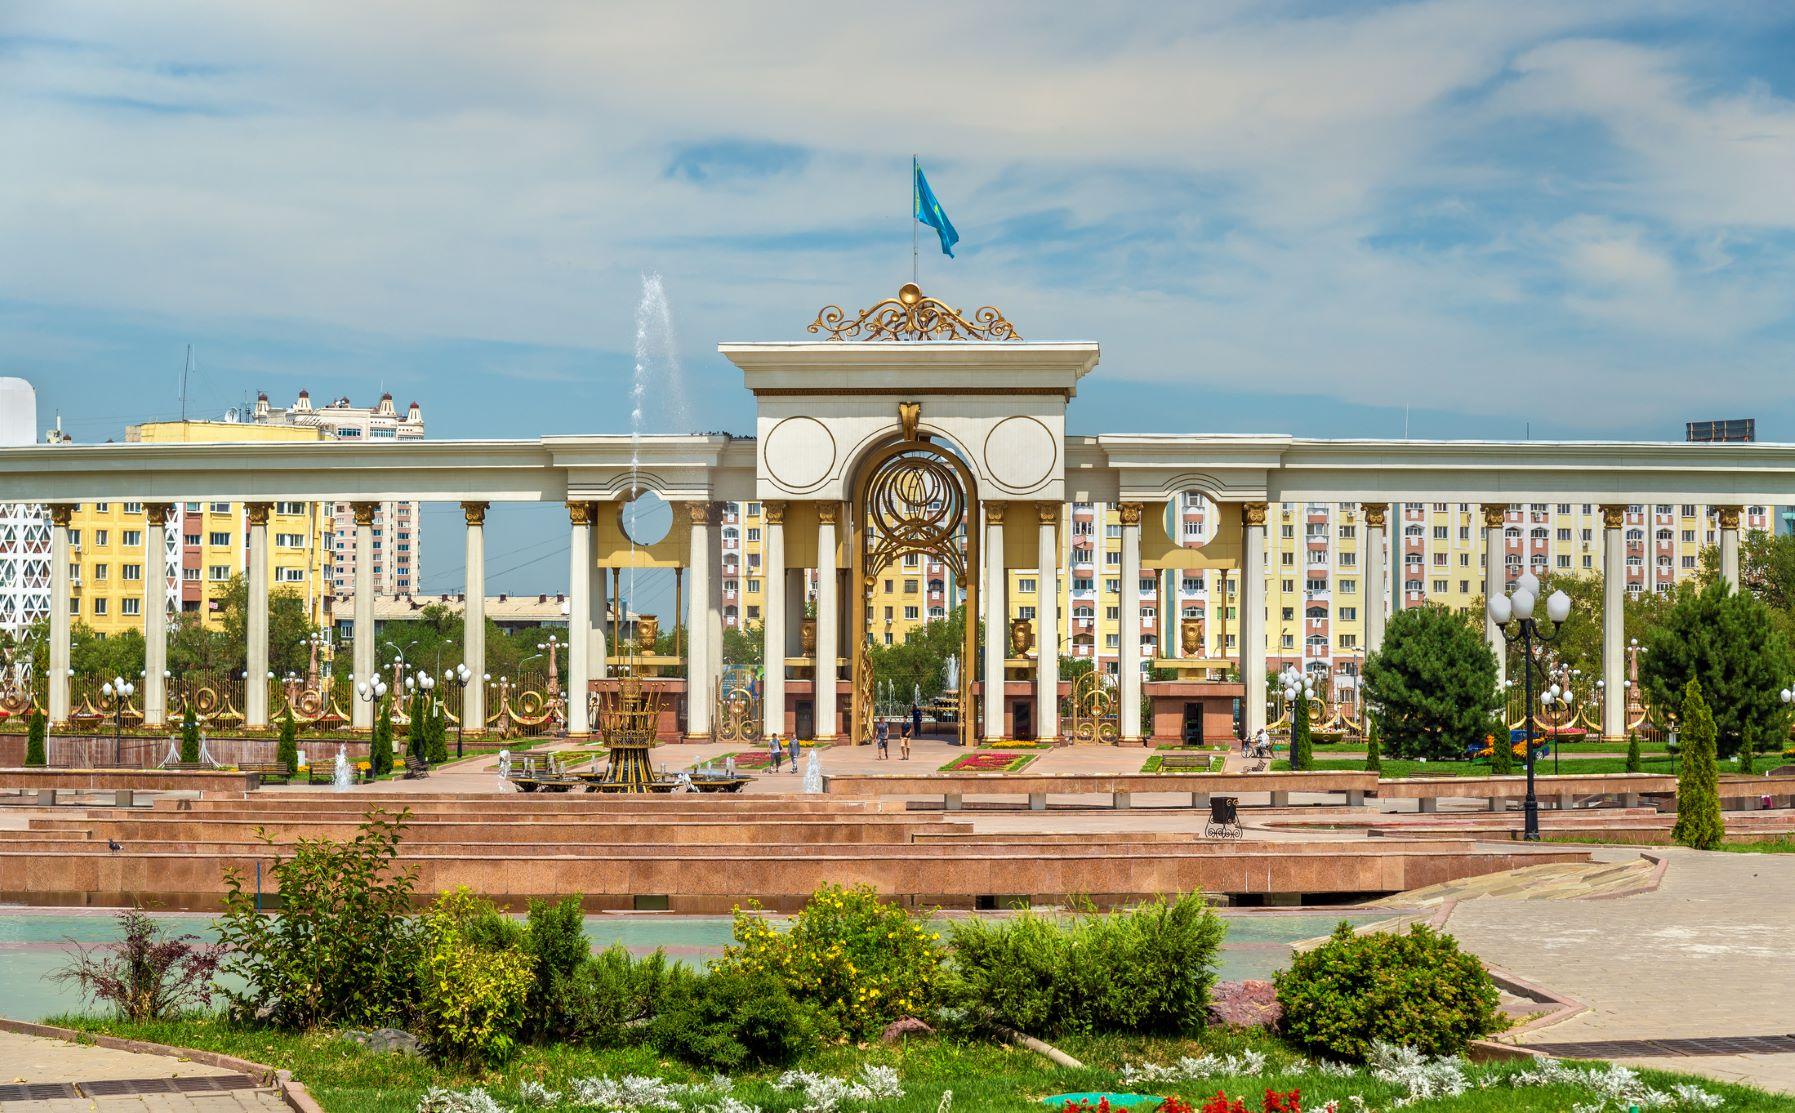 Astana capital city of Kazakhstan with landmark Baiterek tower